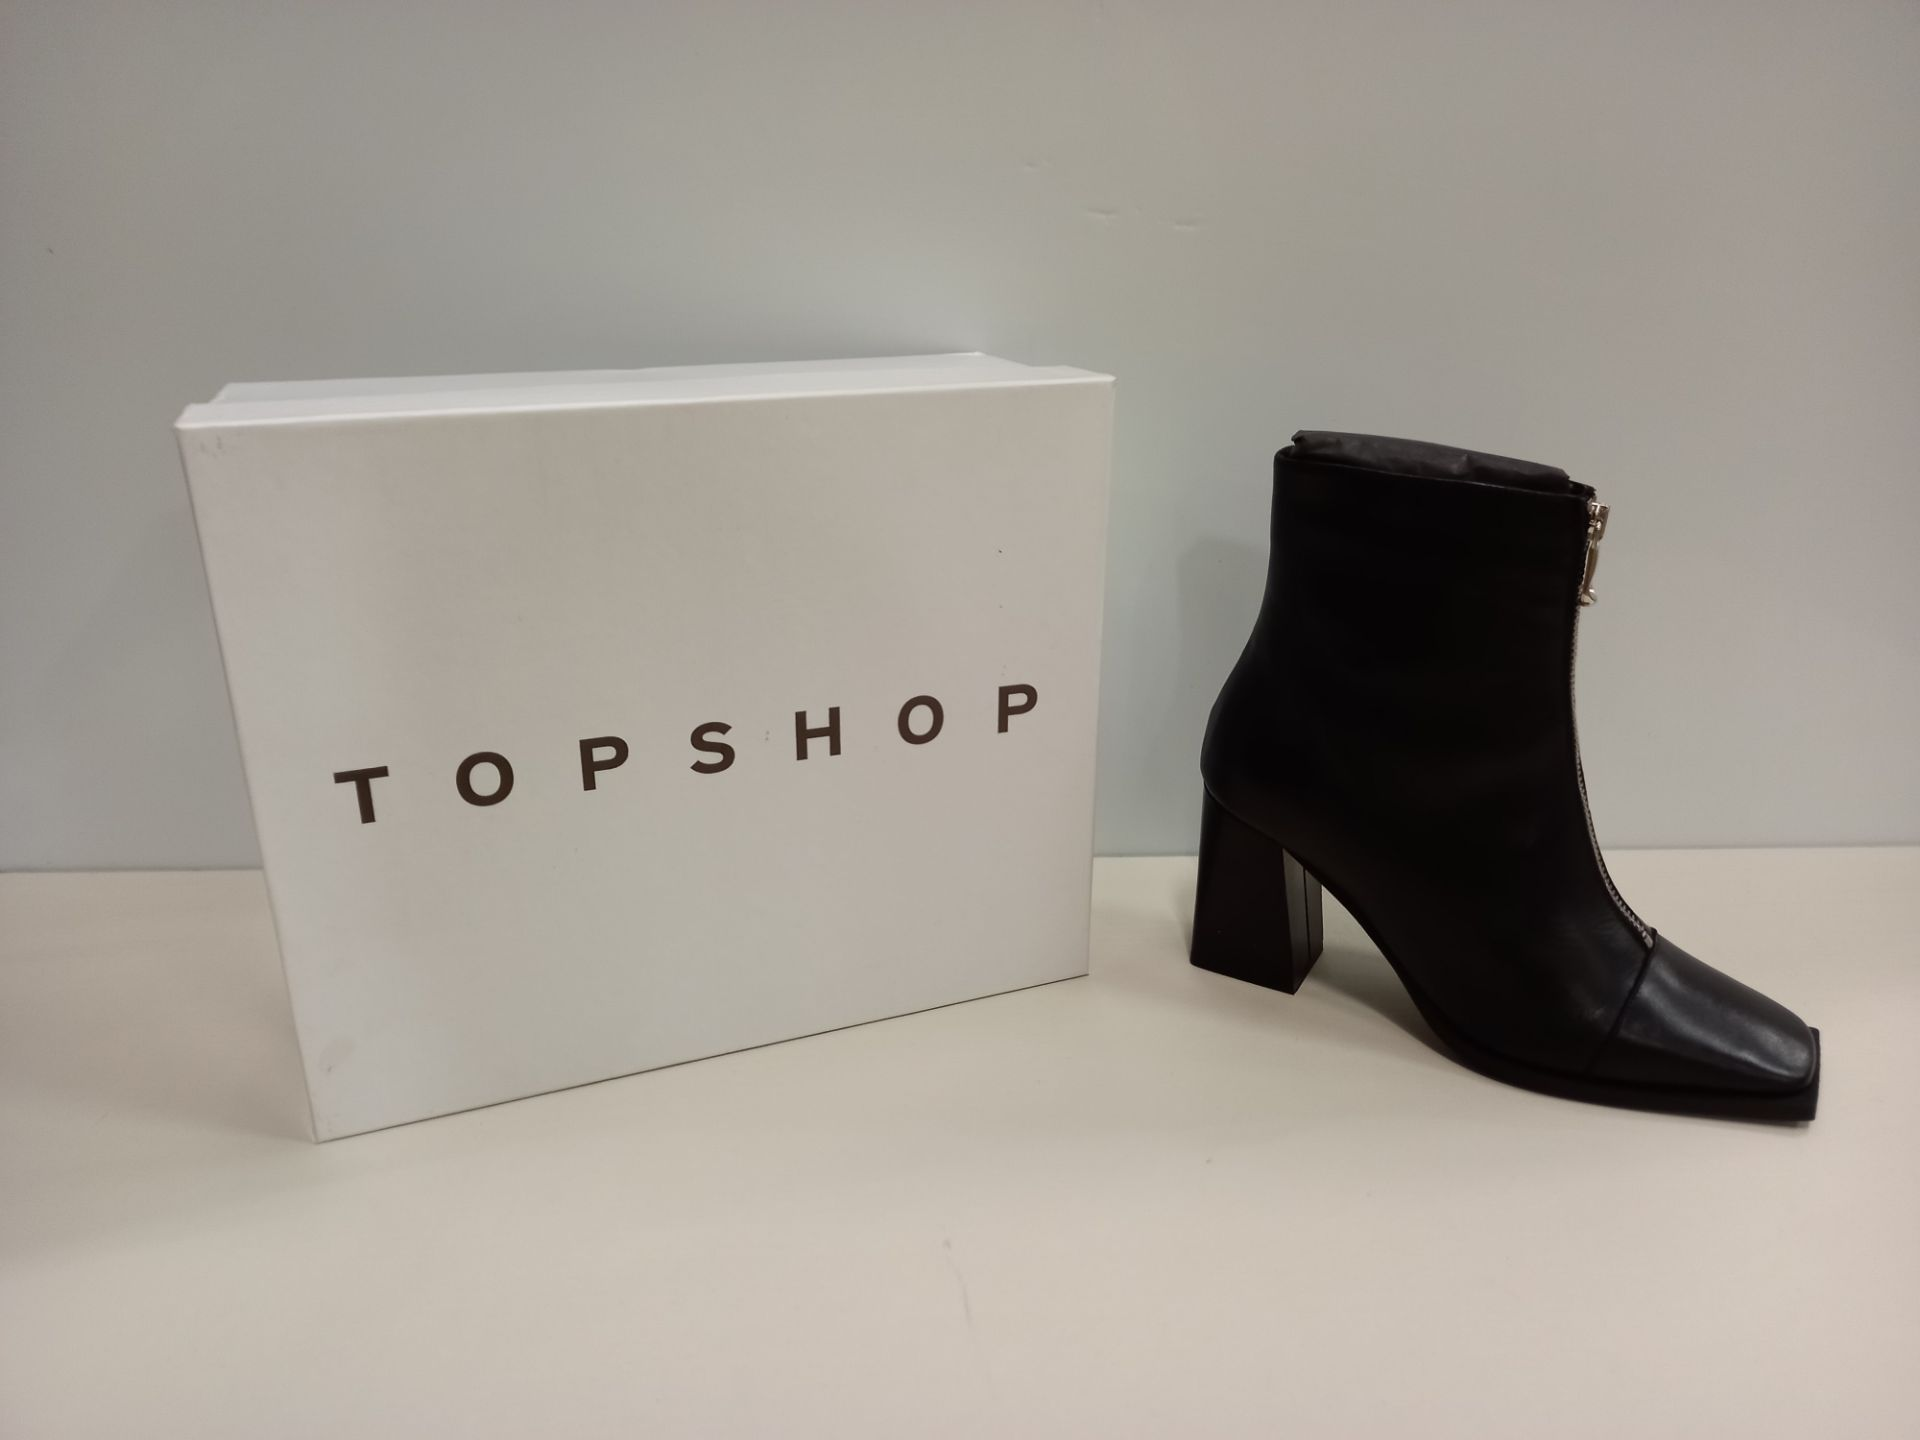 9 X BRAND NEW TOPSHOP HEIDI BLACK SHOES UK SIZE 5 RRP £89.00 (TOTAL RRP £801.00)